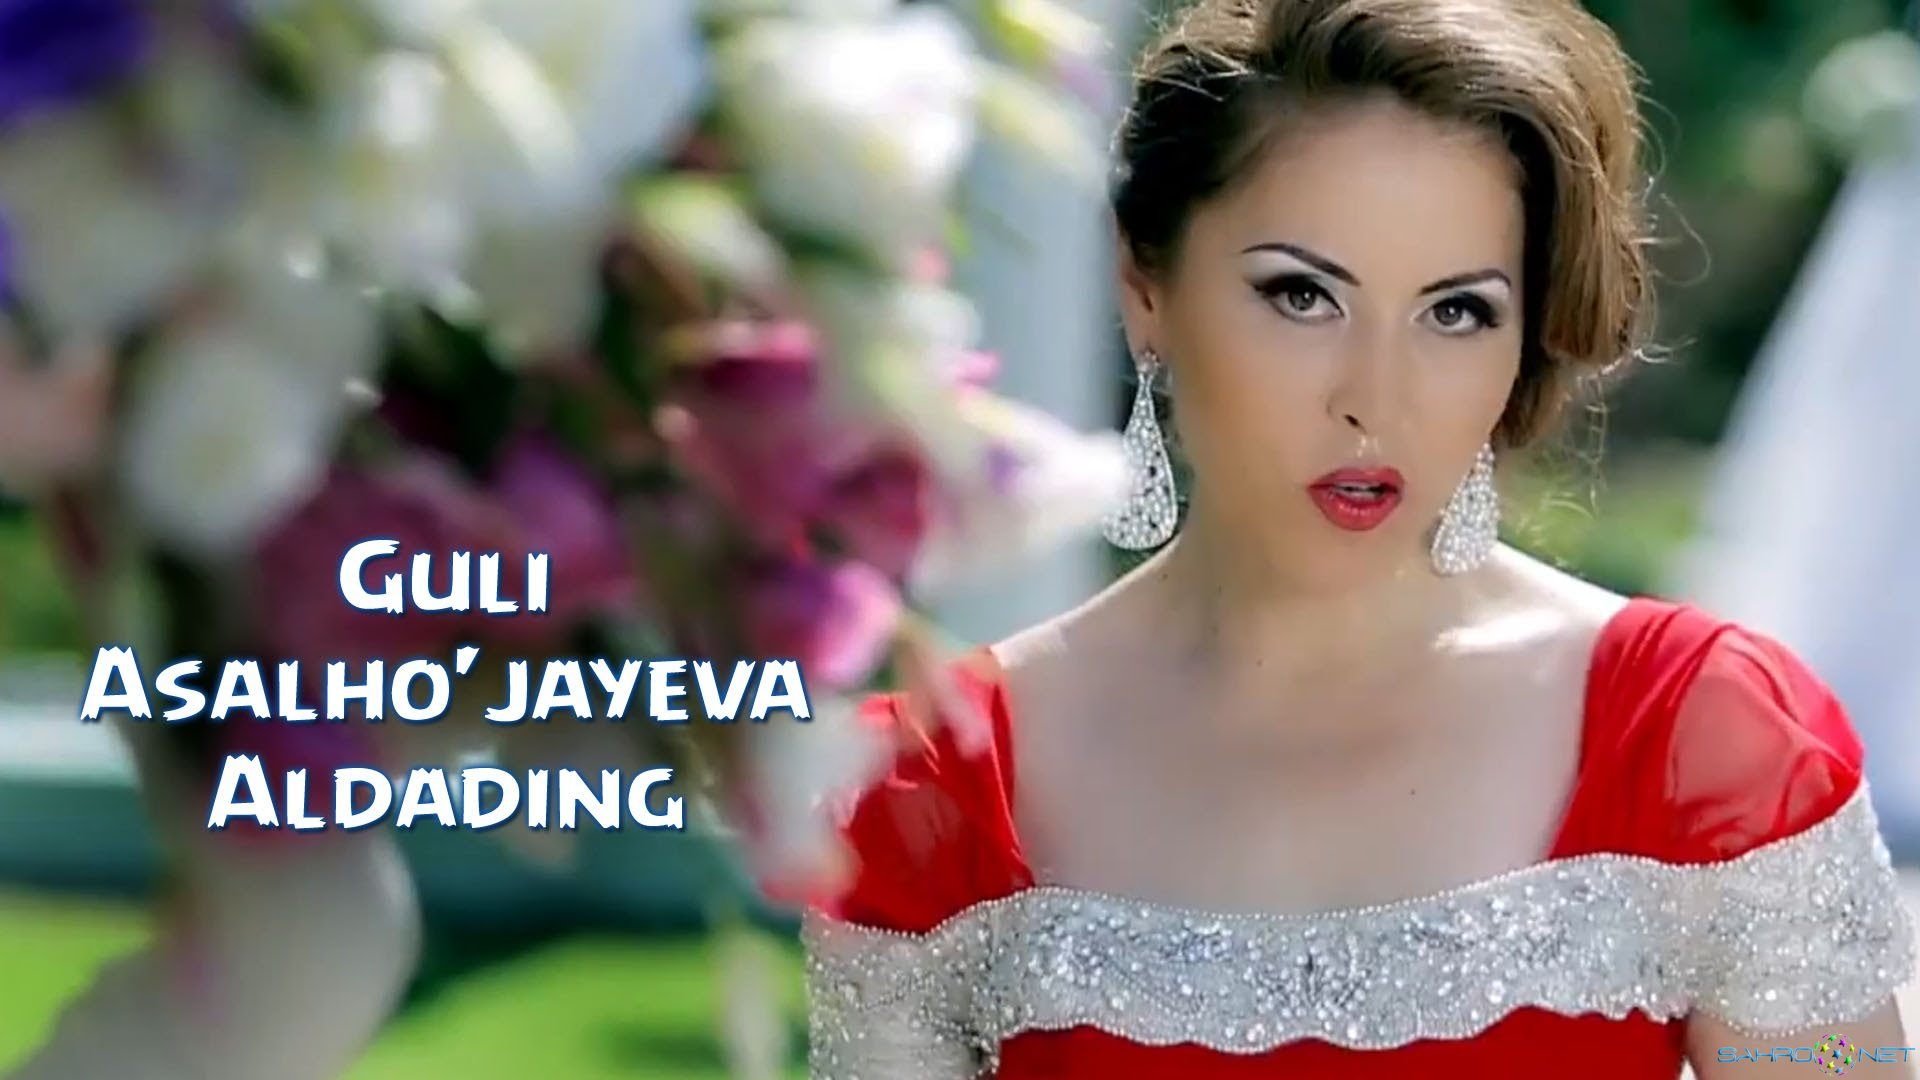 GULI ASALXO JAYEVA MP3 СКАЧАТЬ БЕСПЛАТНО